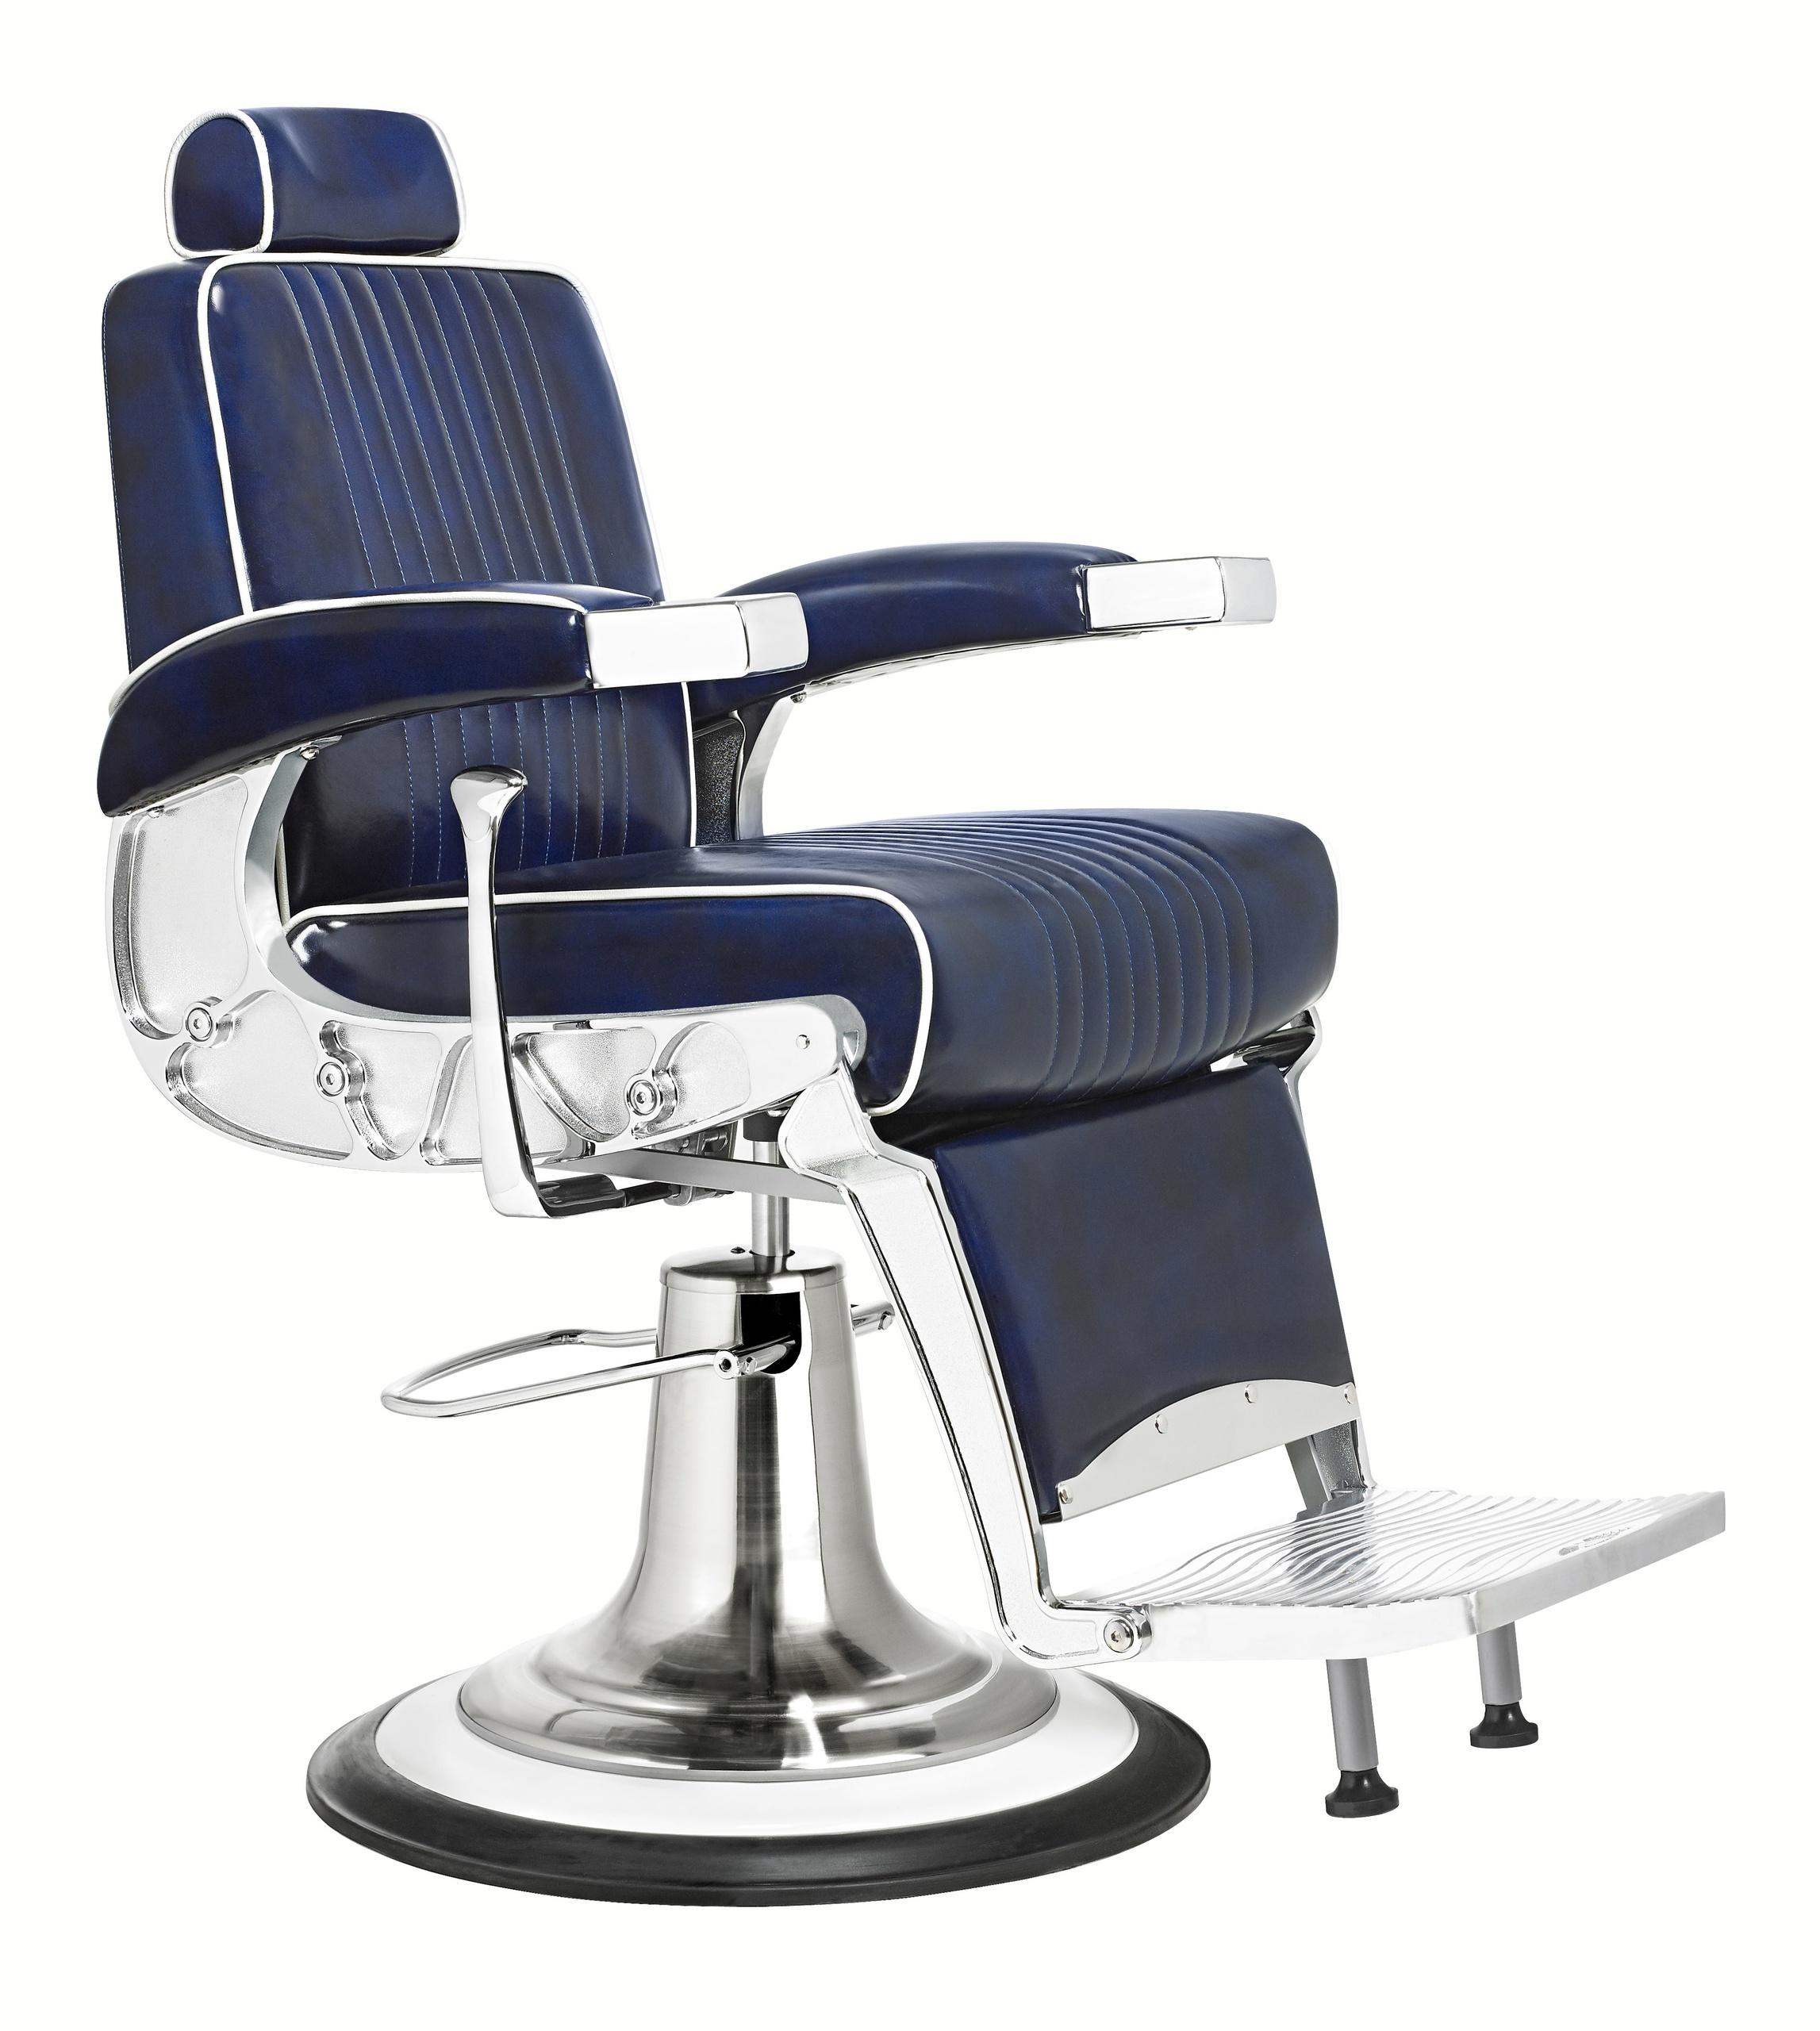 fauteuil barbier vintage mustang jacques seban baf5 jacques seban. Black Bedroom Furniture Sets. Home Design Ideas